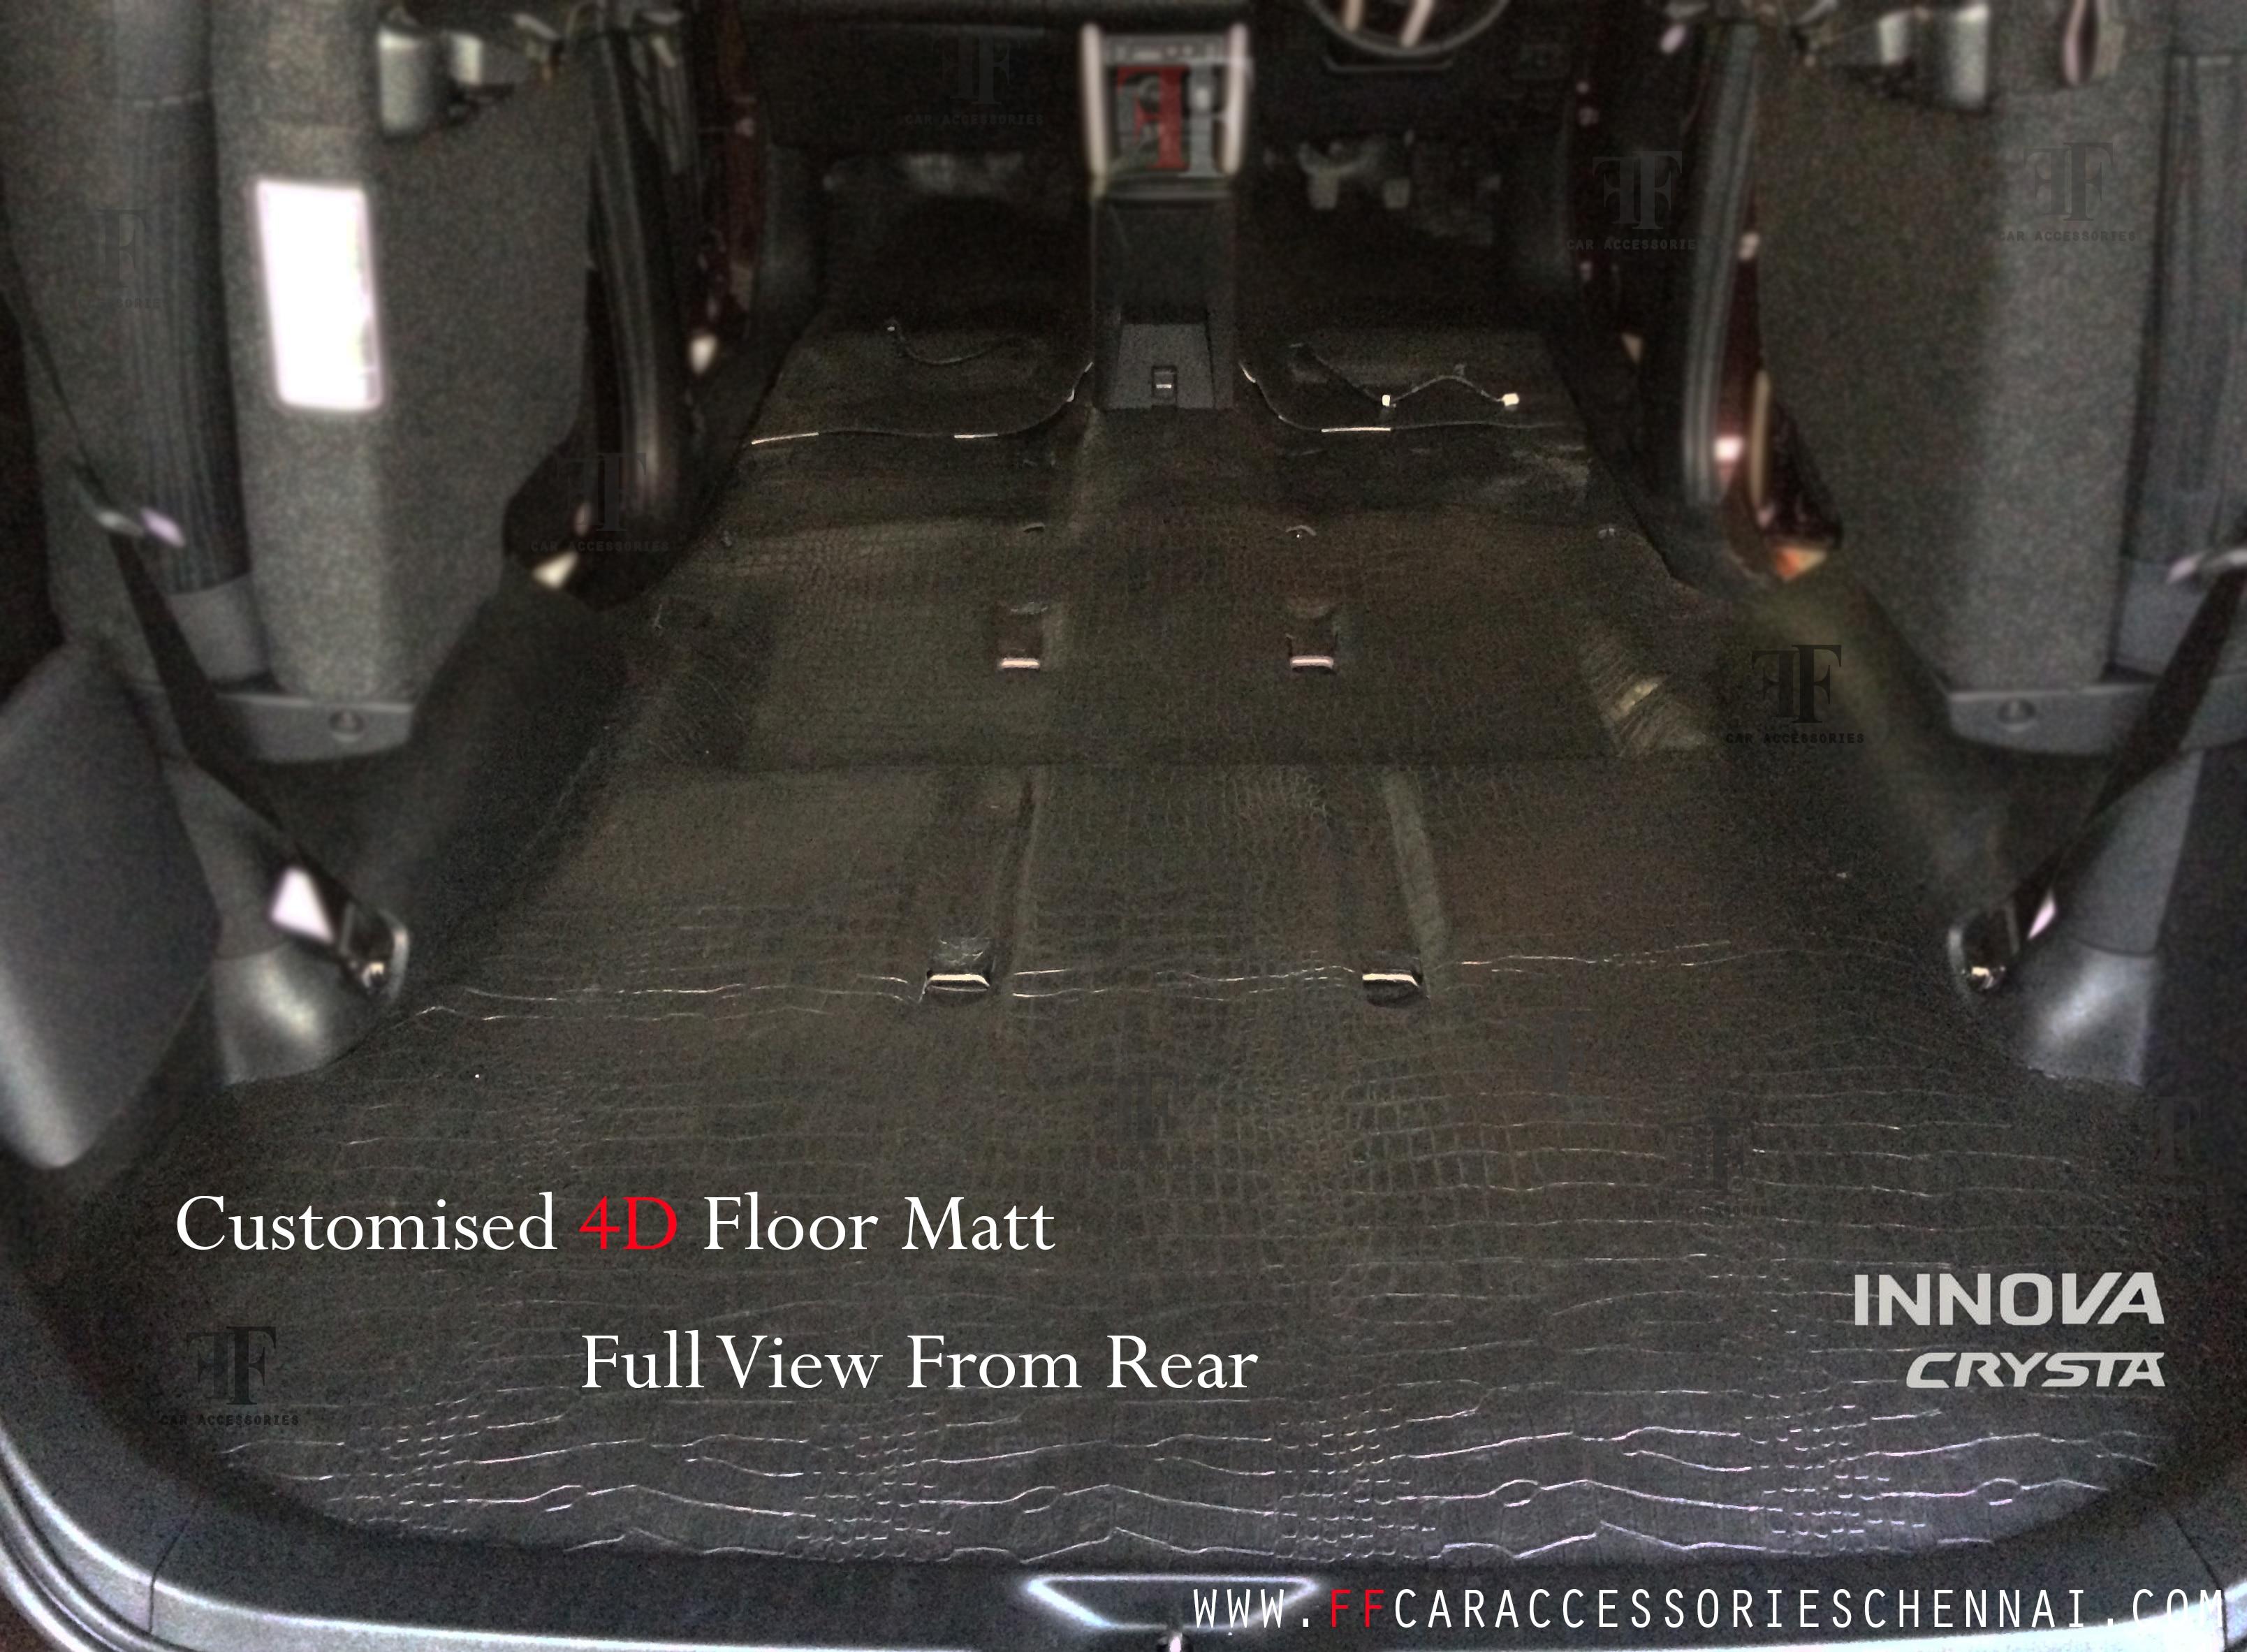 Floor mats price in chennai - Car Accessories Dealer Ff Car Accessories Comes With 4d Floor Matt Wrinkle Free No